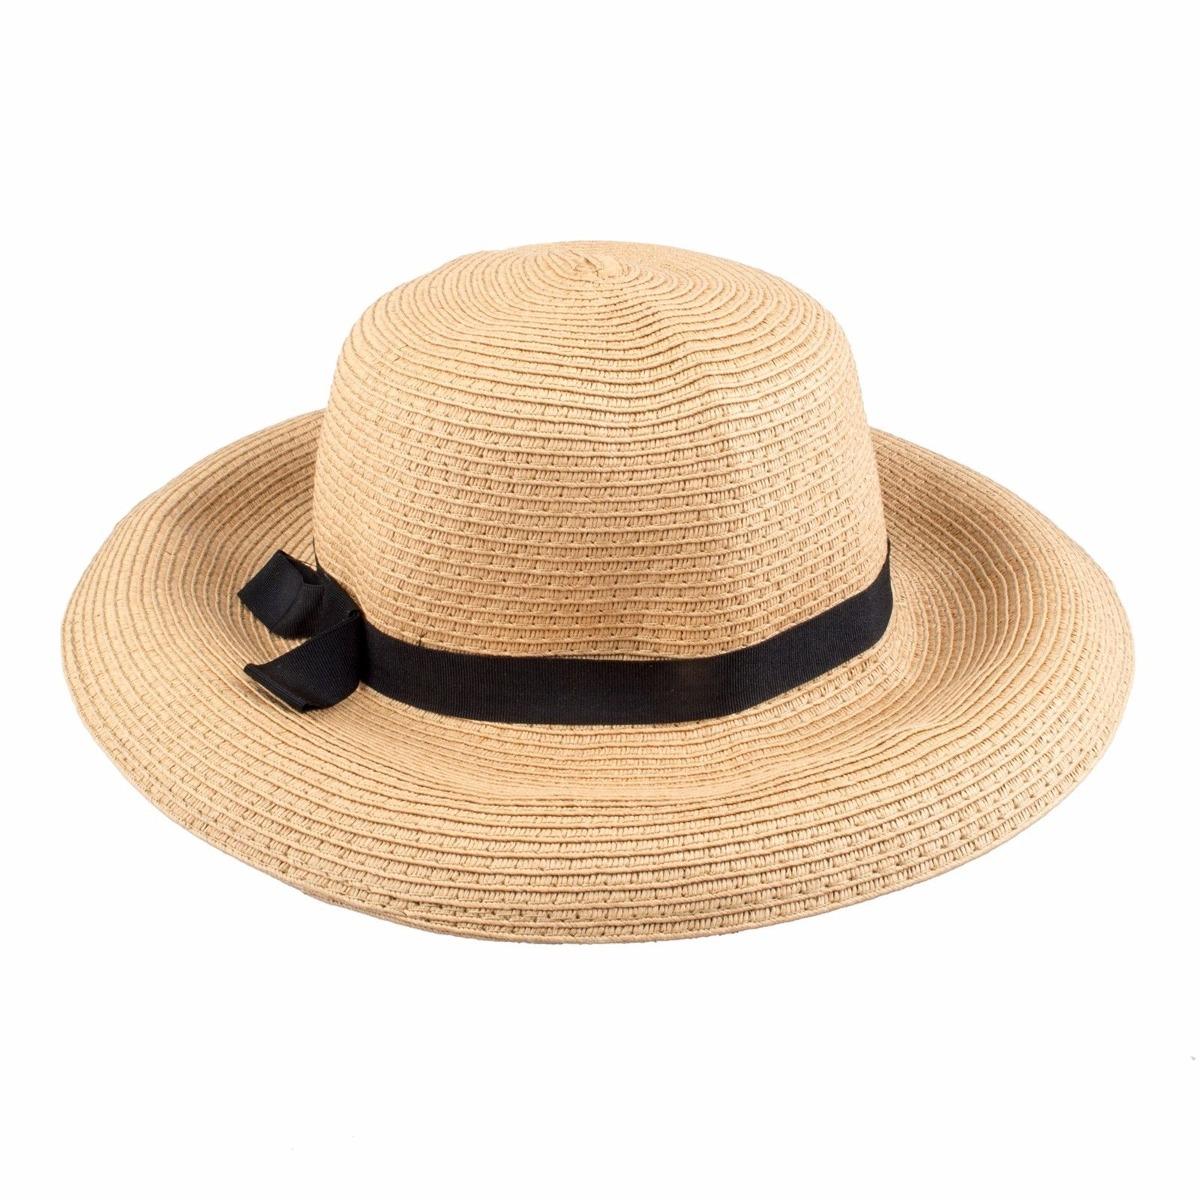 67e08f155542c las mujeres sombrero plegable ancho ala paja... (khaki). Cargando zoom.